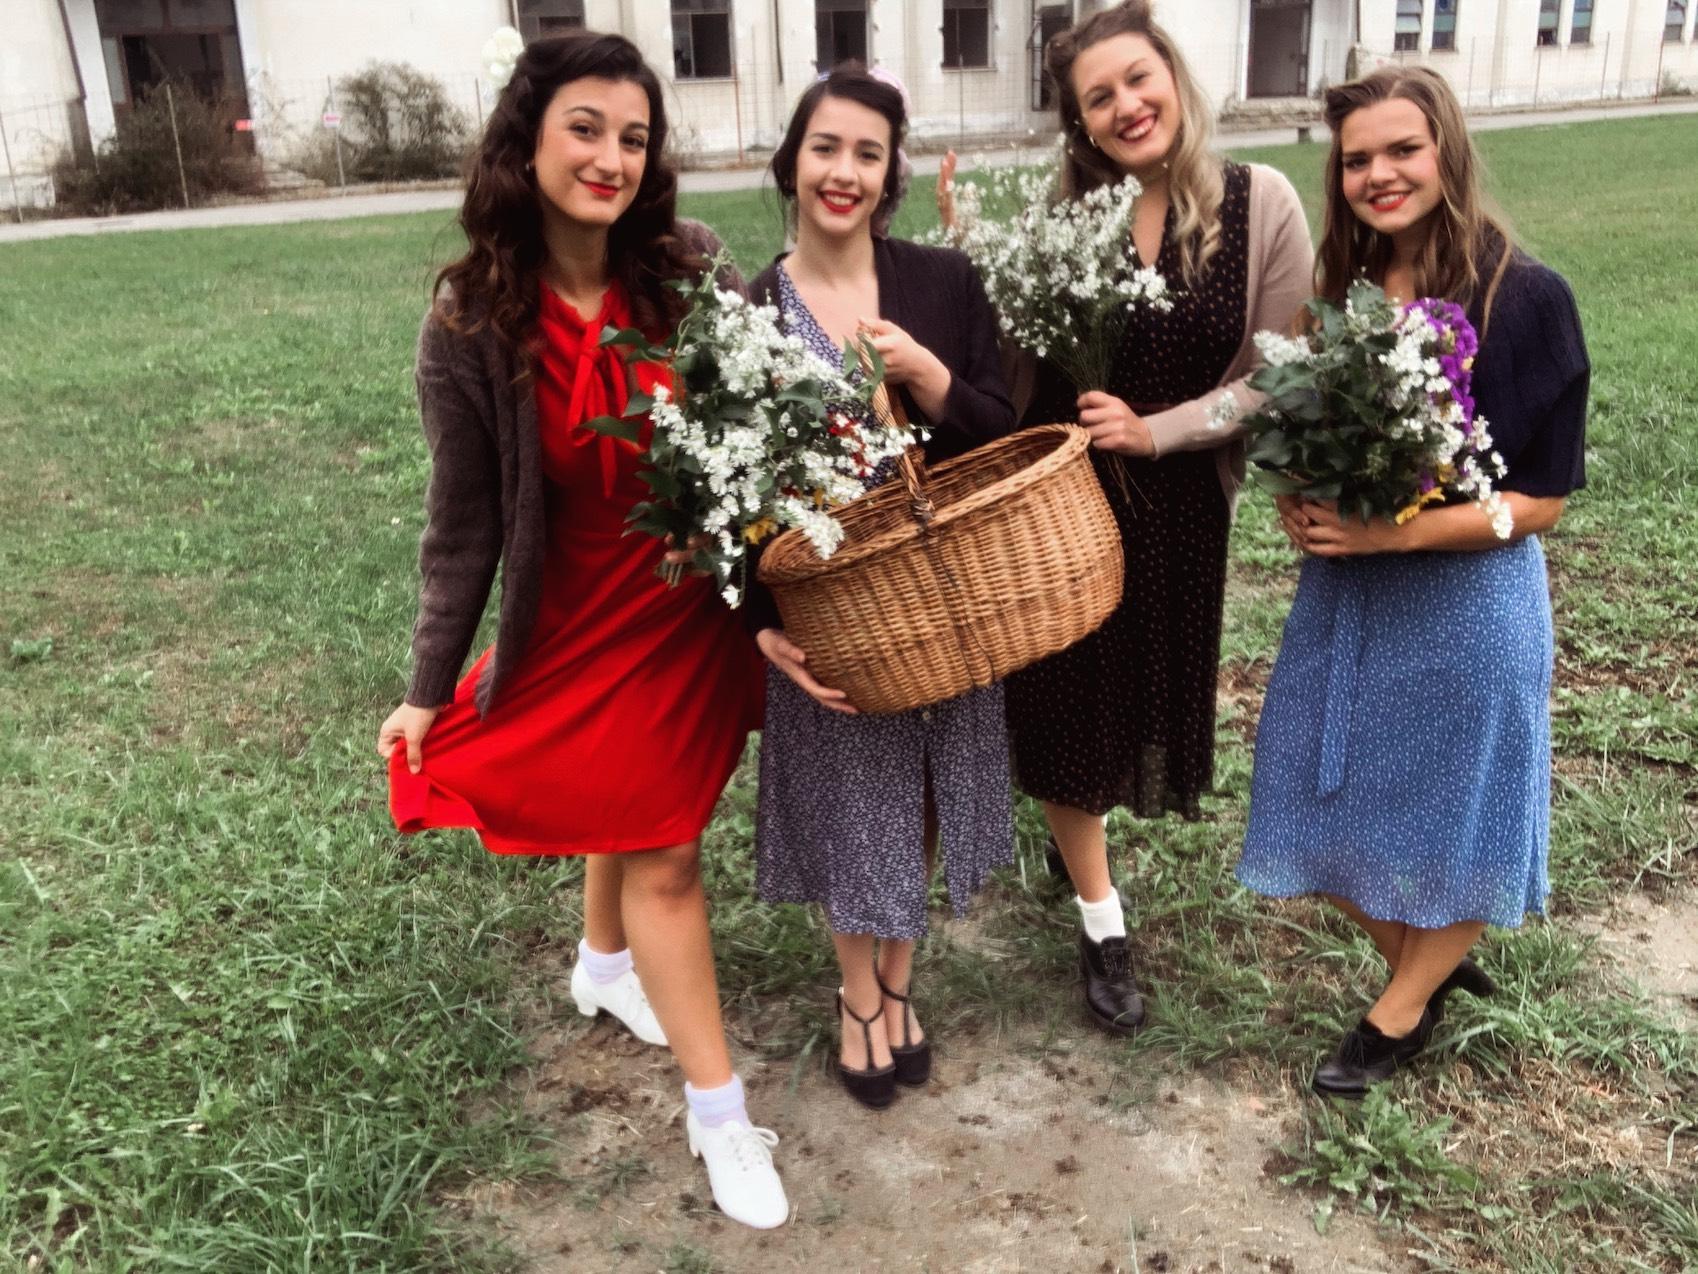 The april daisis, rievocazione storica